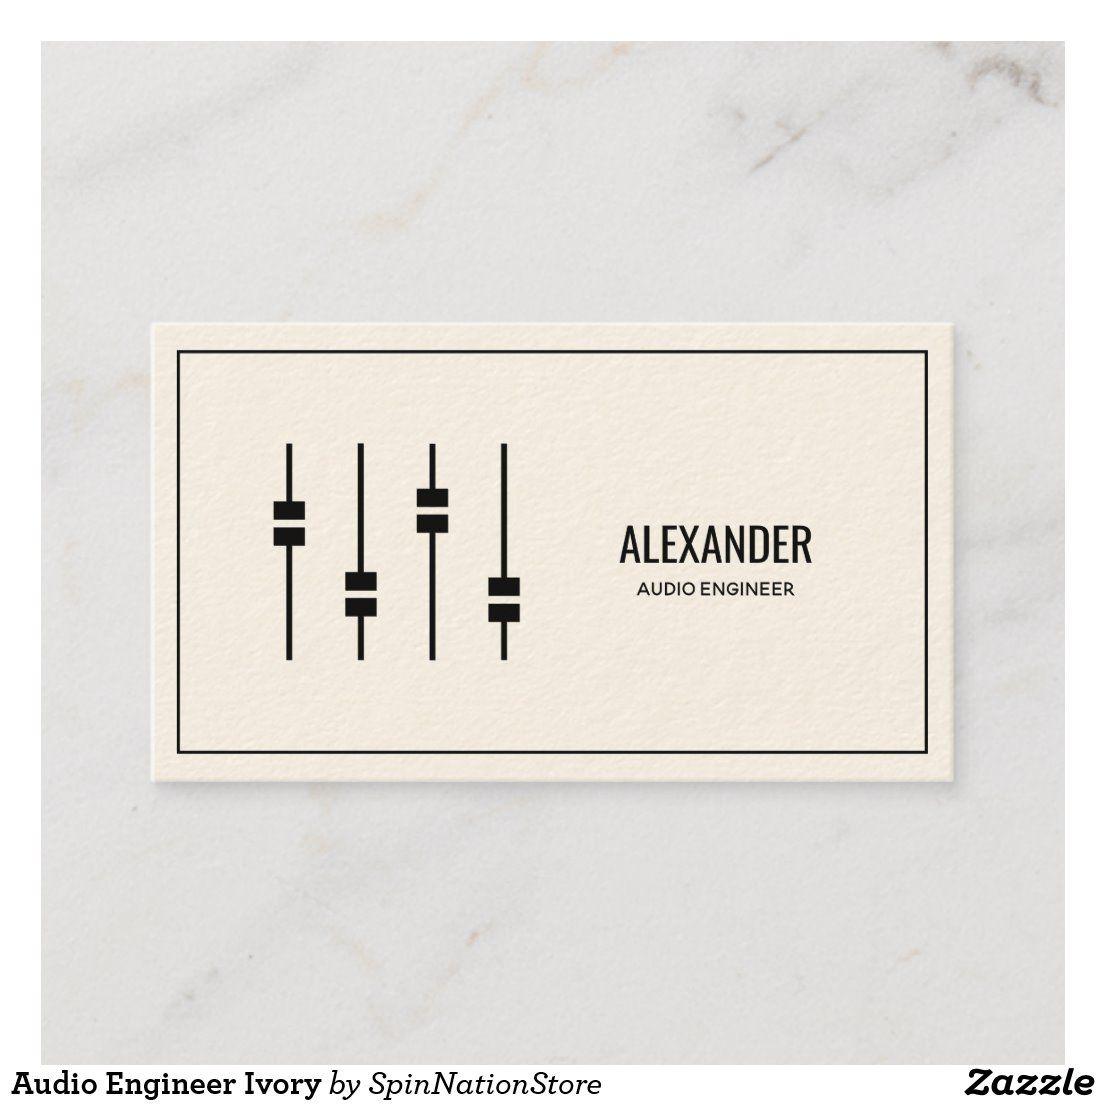 audio engineer ivory business card  zazzle  audio